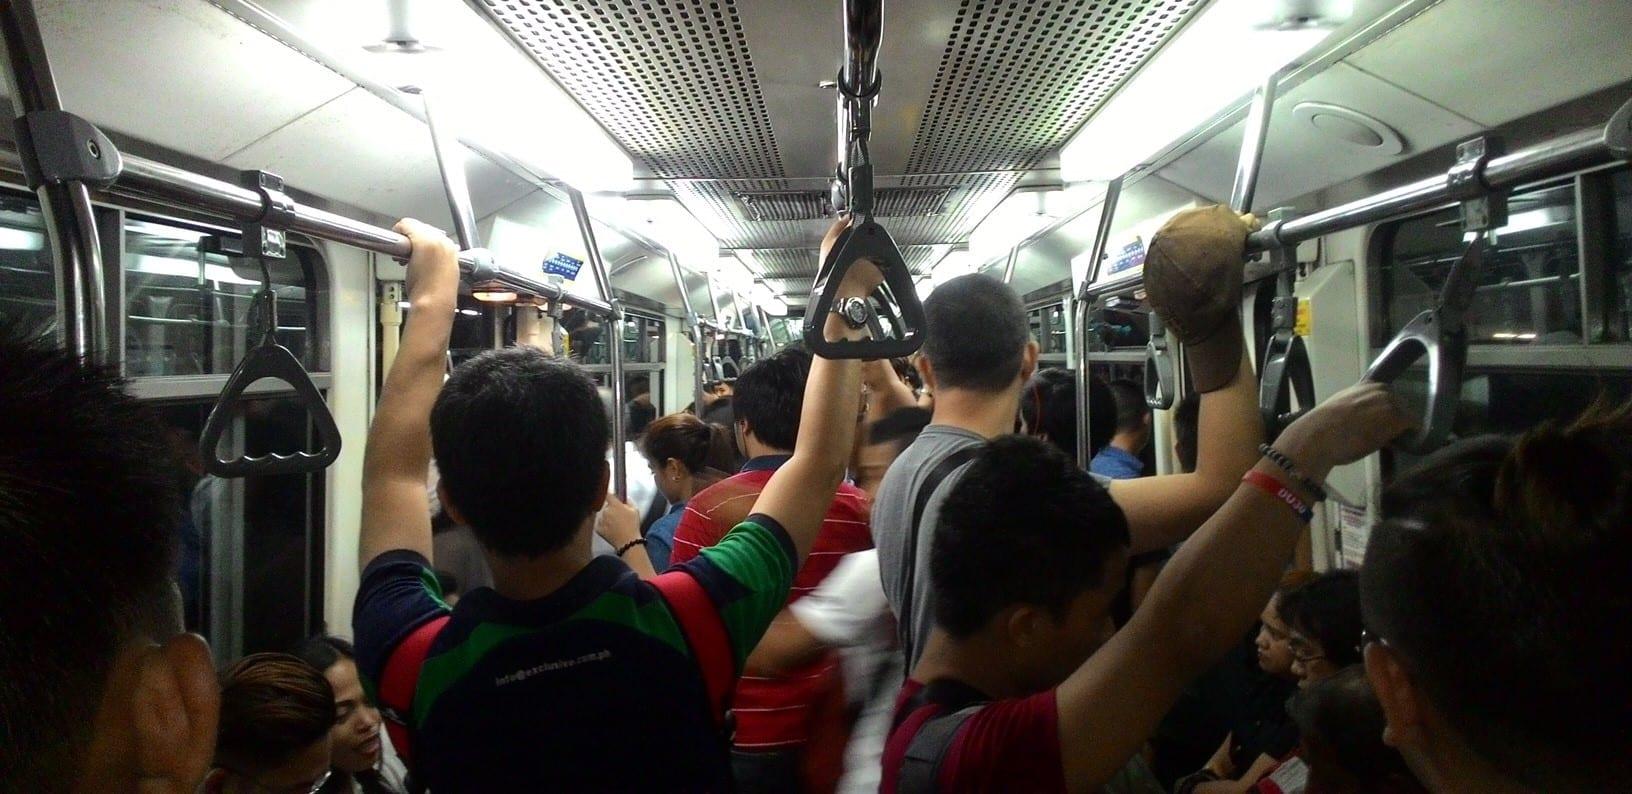 mrt-inside-photo-commuters